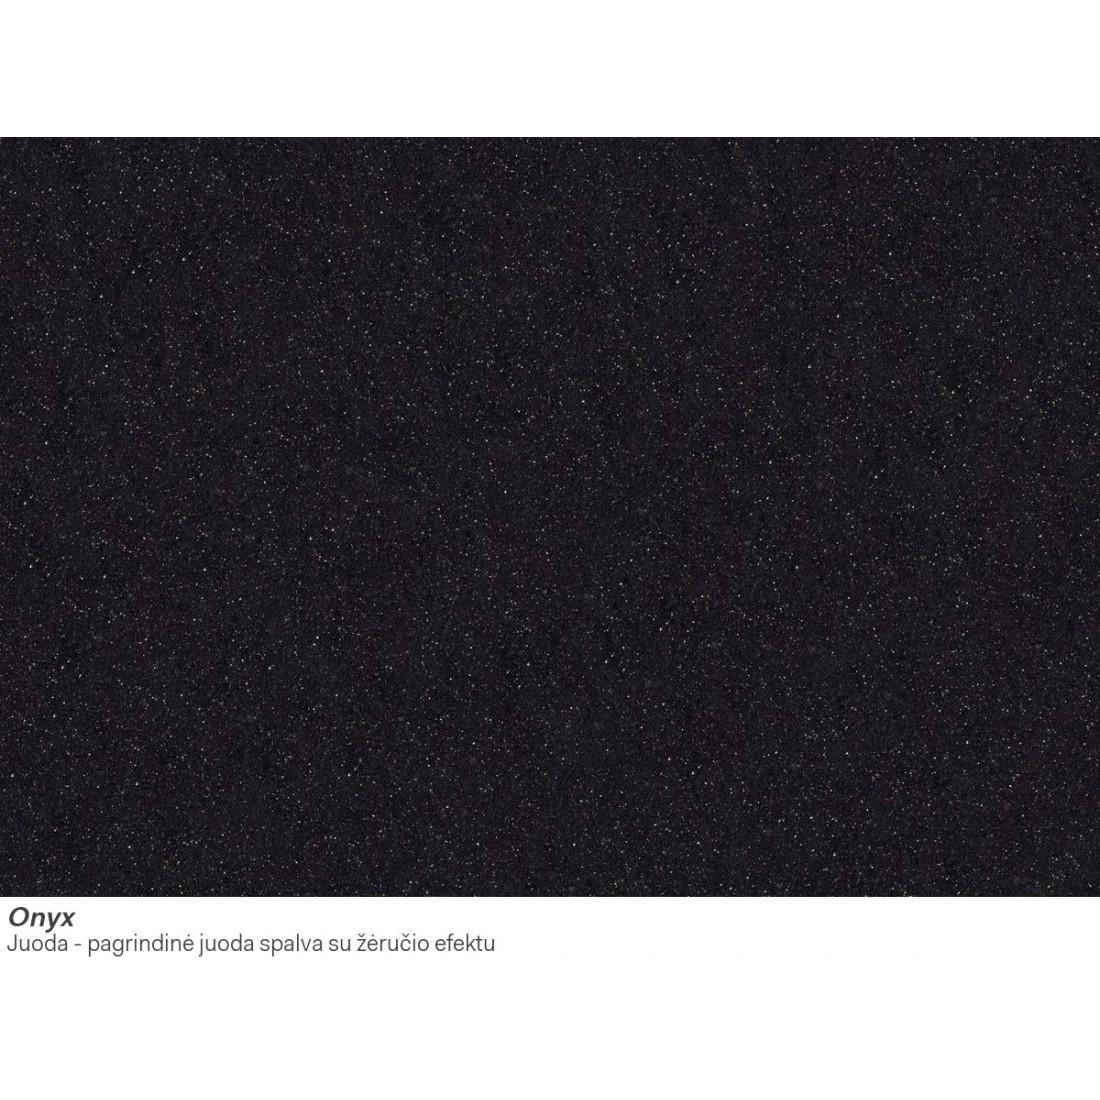 Akmens masės plautuvė Franke Ronda ROG 611-62, užkemšamas ventilis, Onyx